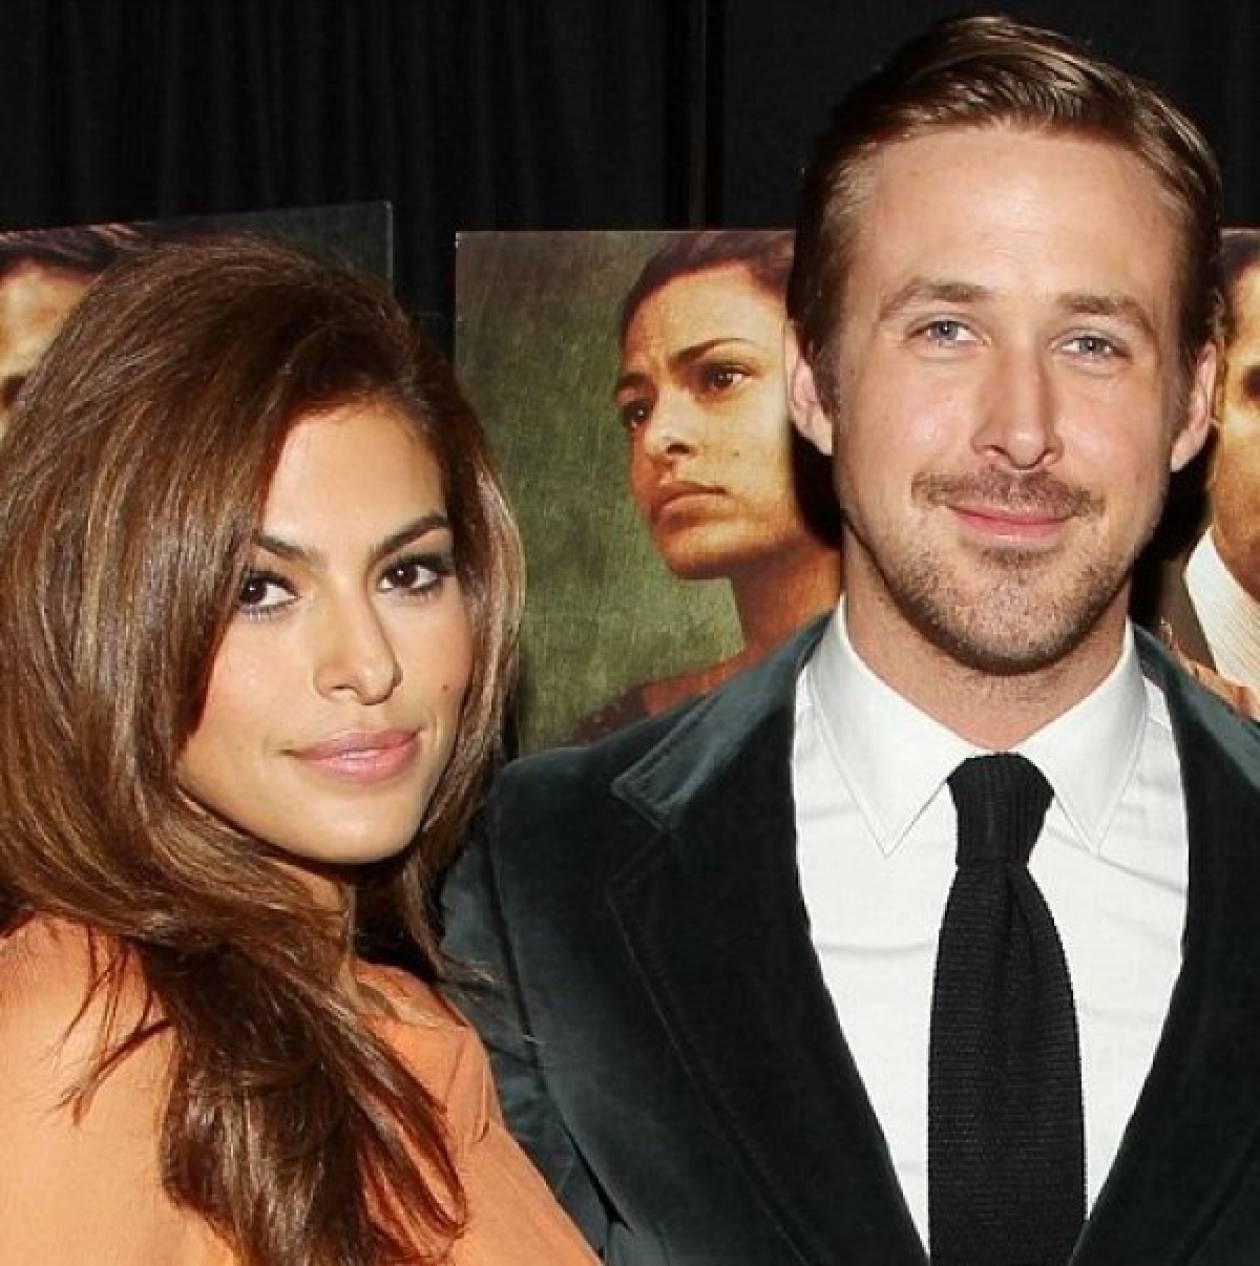 H Mendes μιλά για τον χωρισμό της: Πώς θα... τιμήσει τον Gosling;